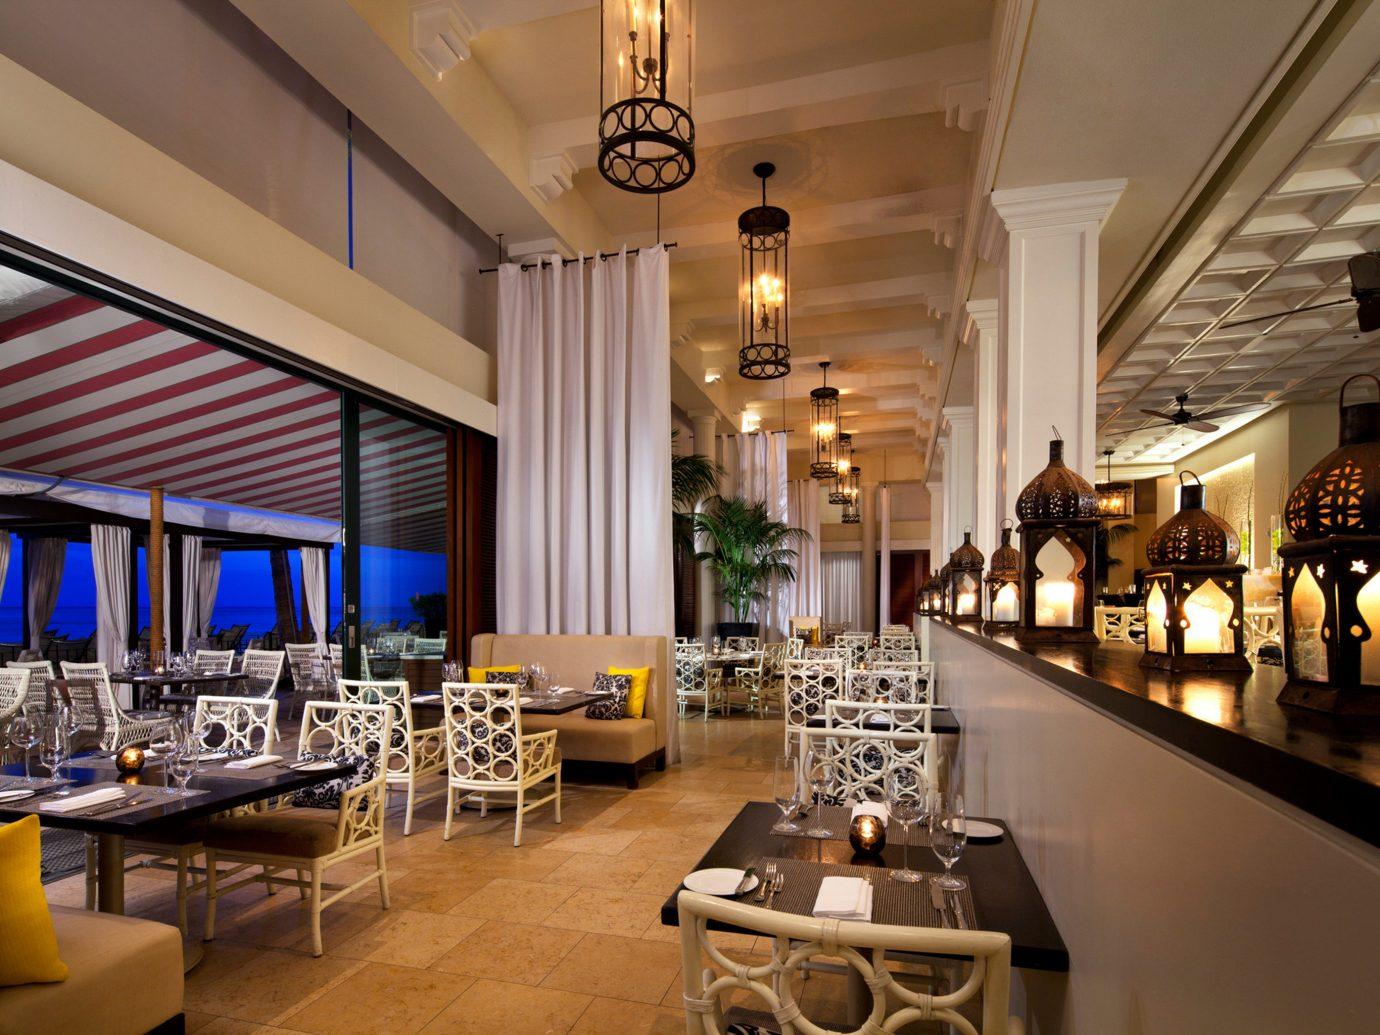 Boutique Hotels Hawaii Honolulu Hotels table indoor room restaurant function hall meal interior design estate Lobby Dining Design ballroom furniture Bar Island